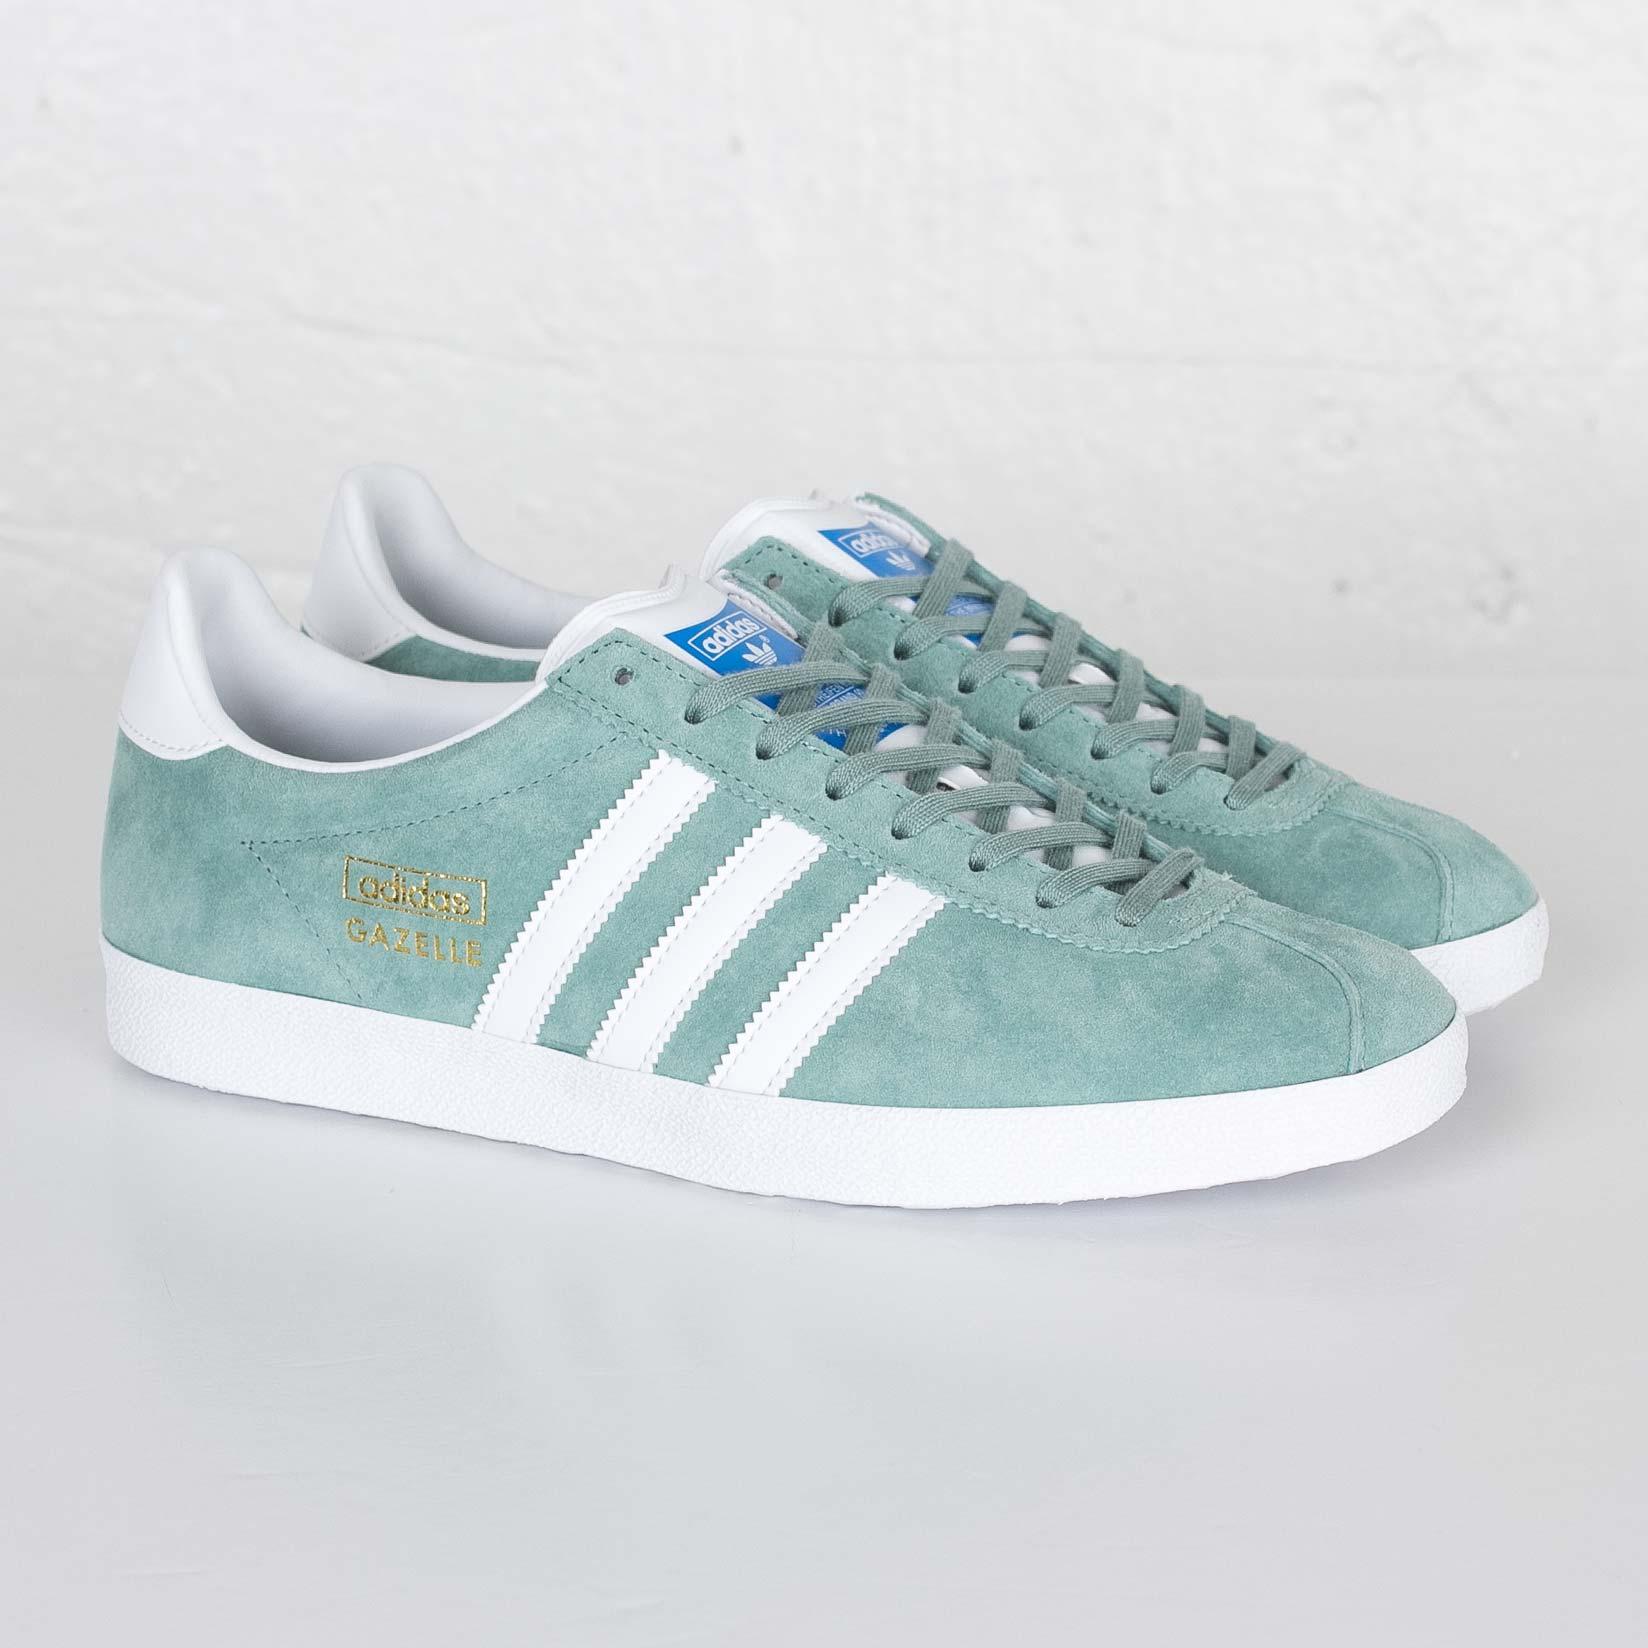 adidas Gazelle OG - S74847 - SNS | sneakers & streetwear online ...